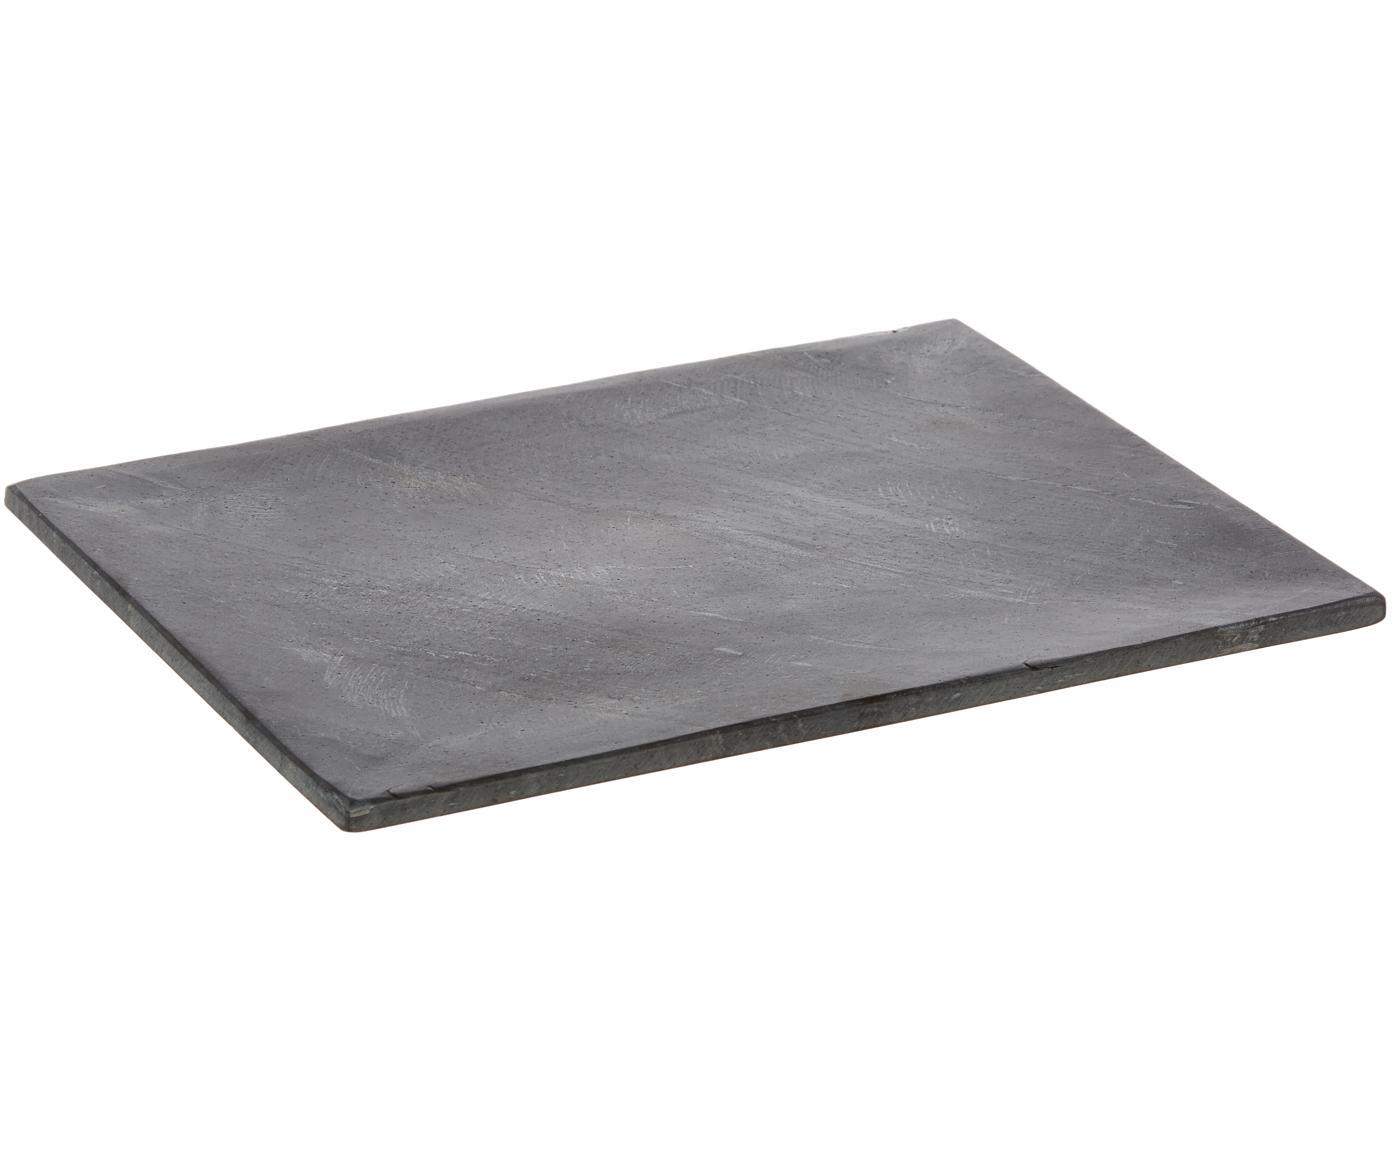 Fuente de granito Klevina, Granito, Gris, An 28 x Al 2 cm